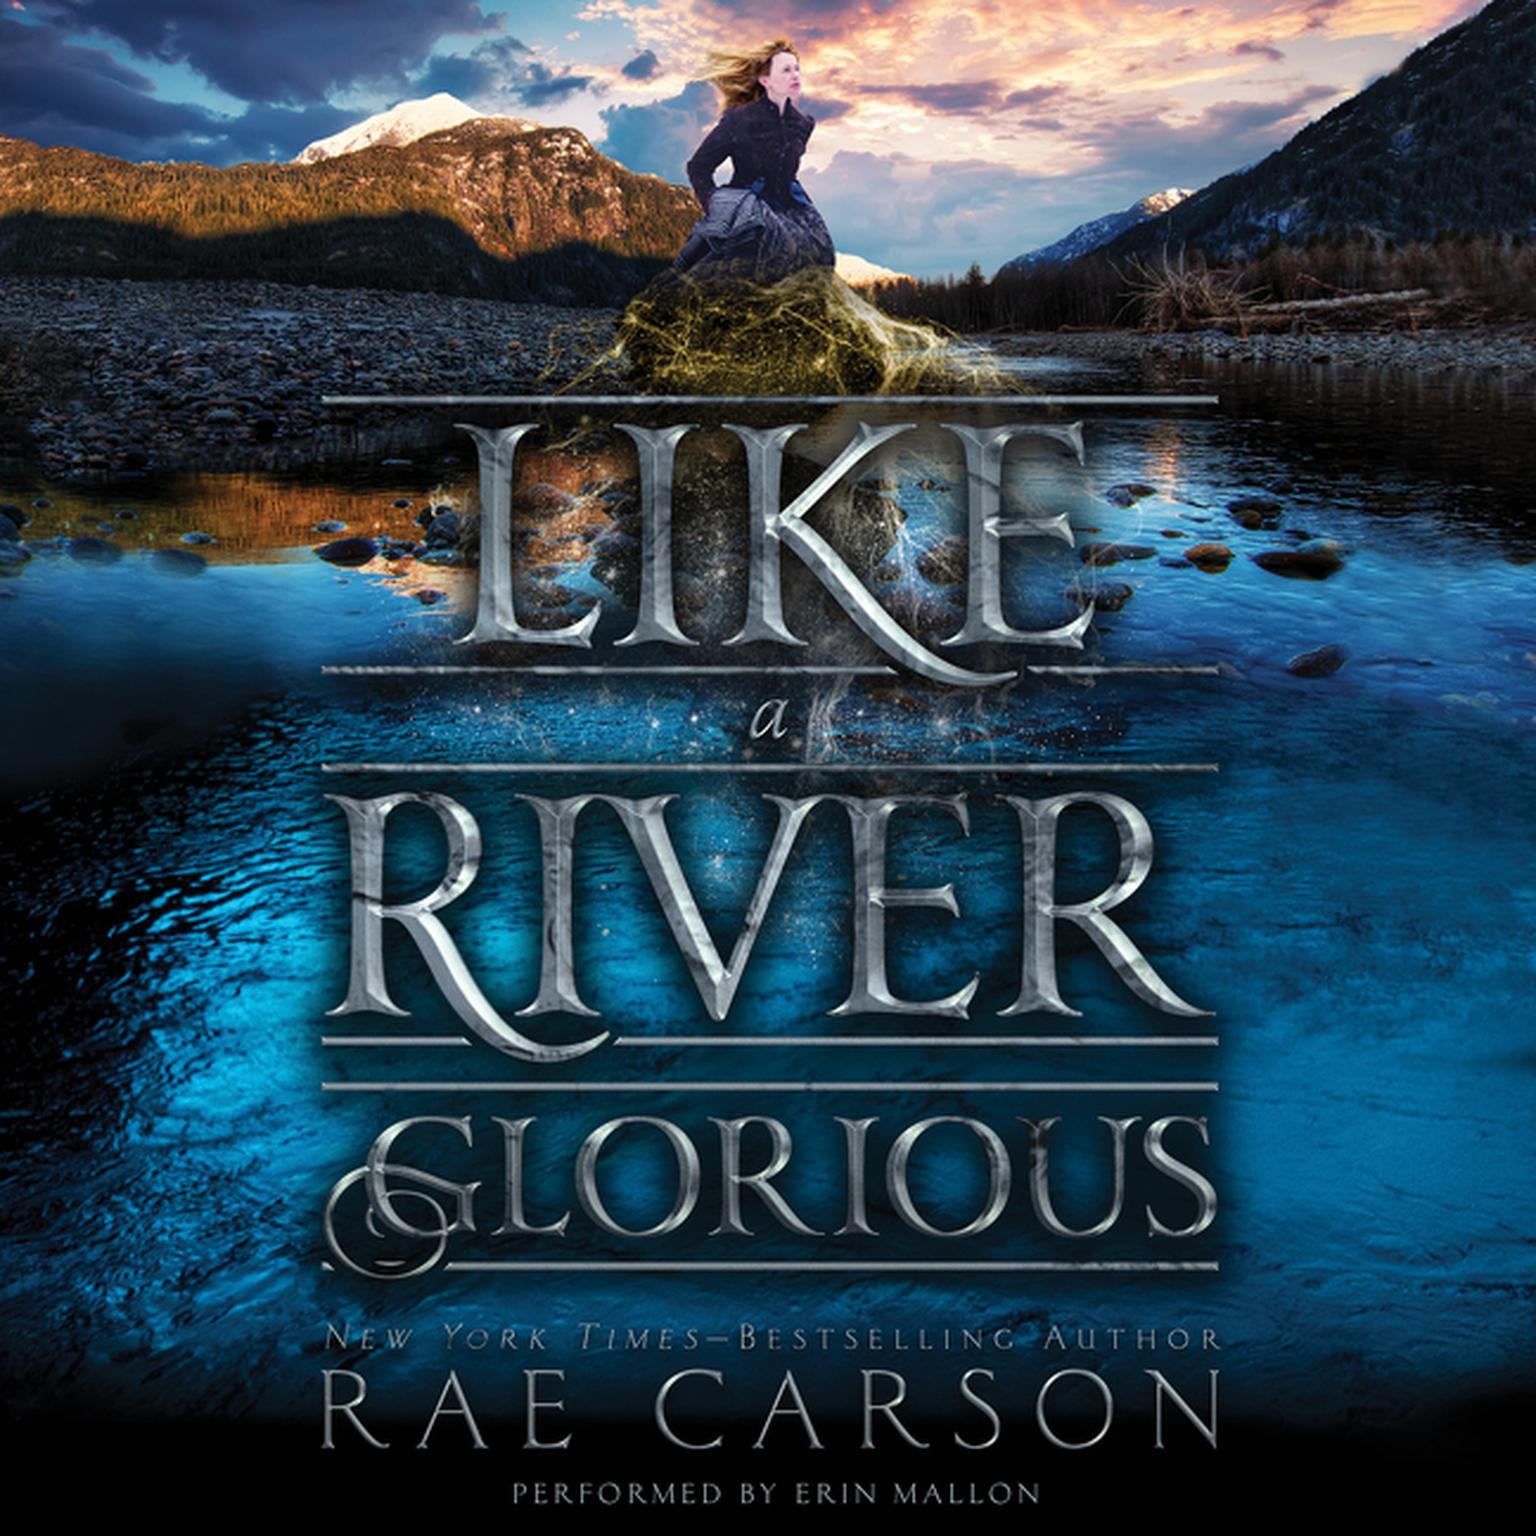 Printable Like a River Glorious Audiobook Cover Art